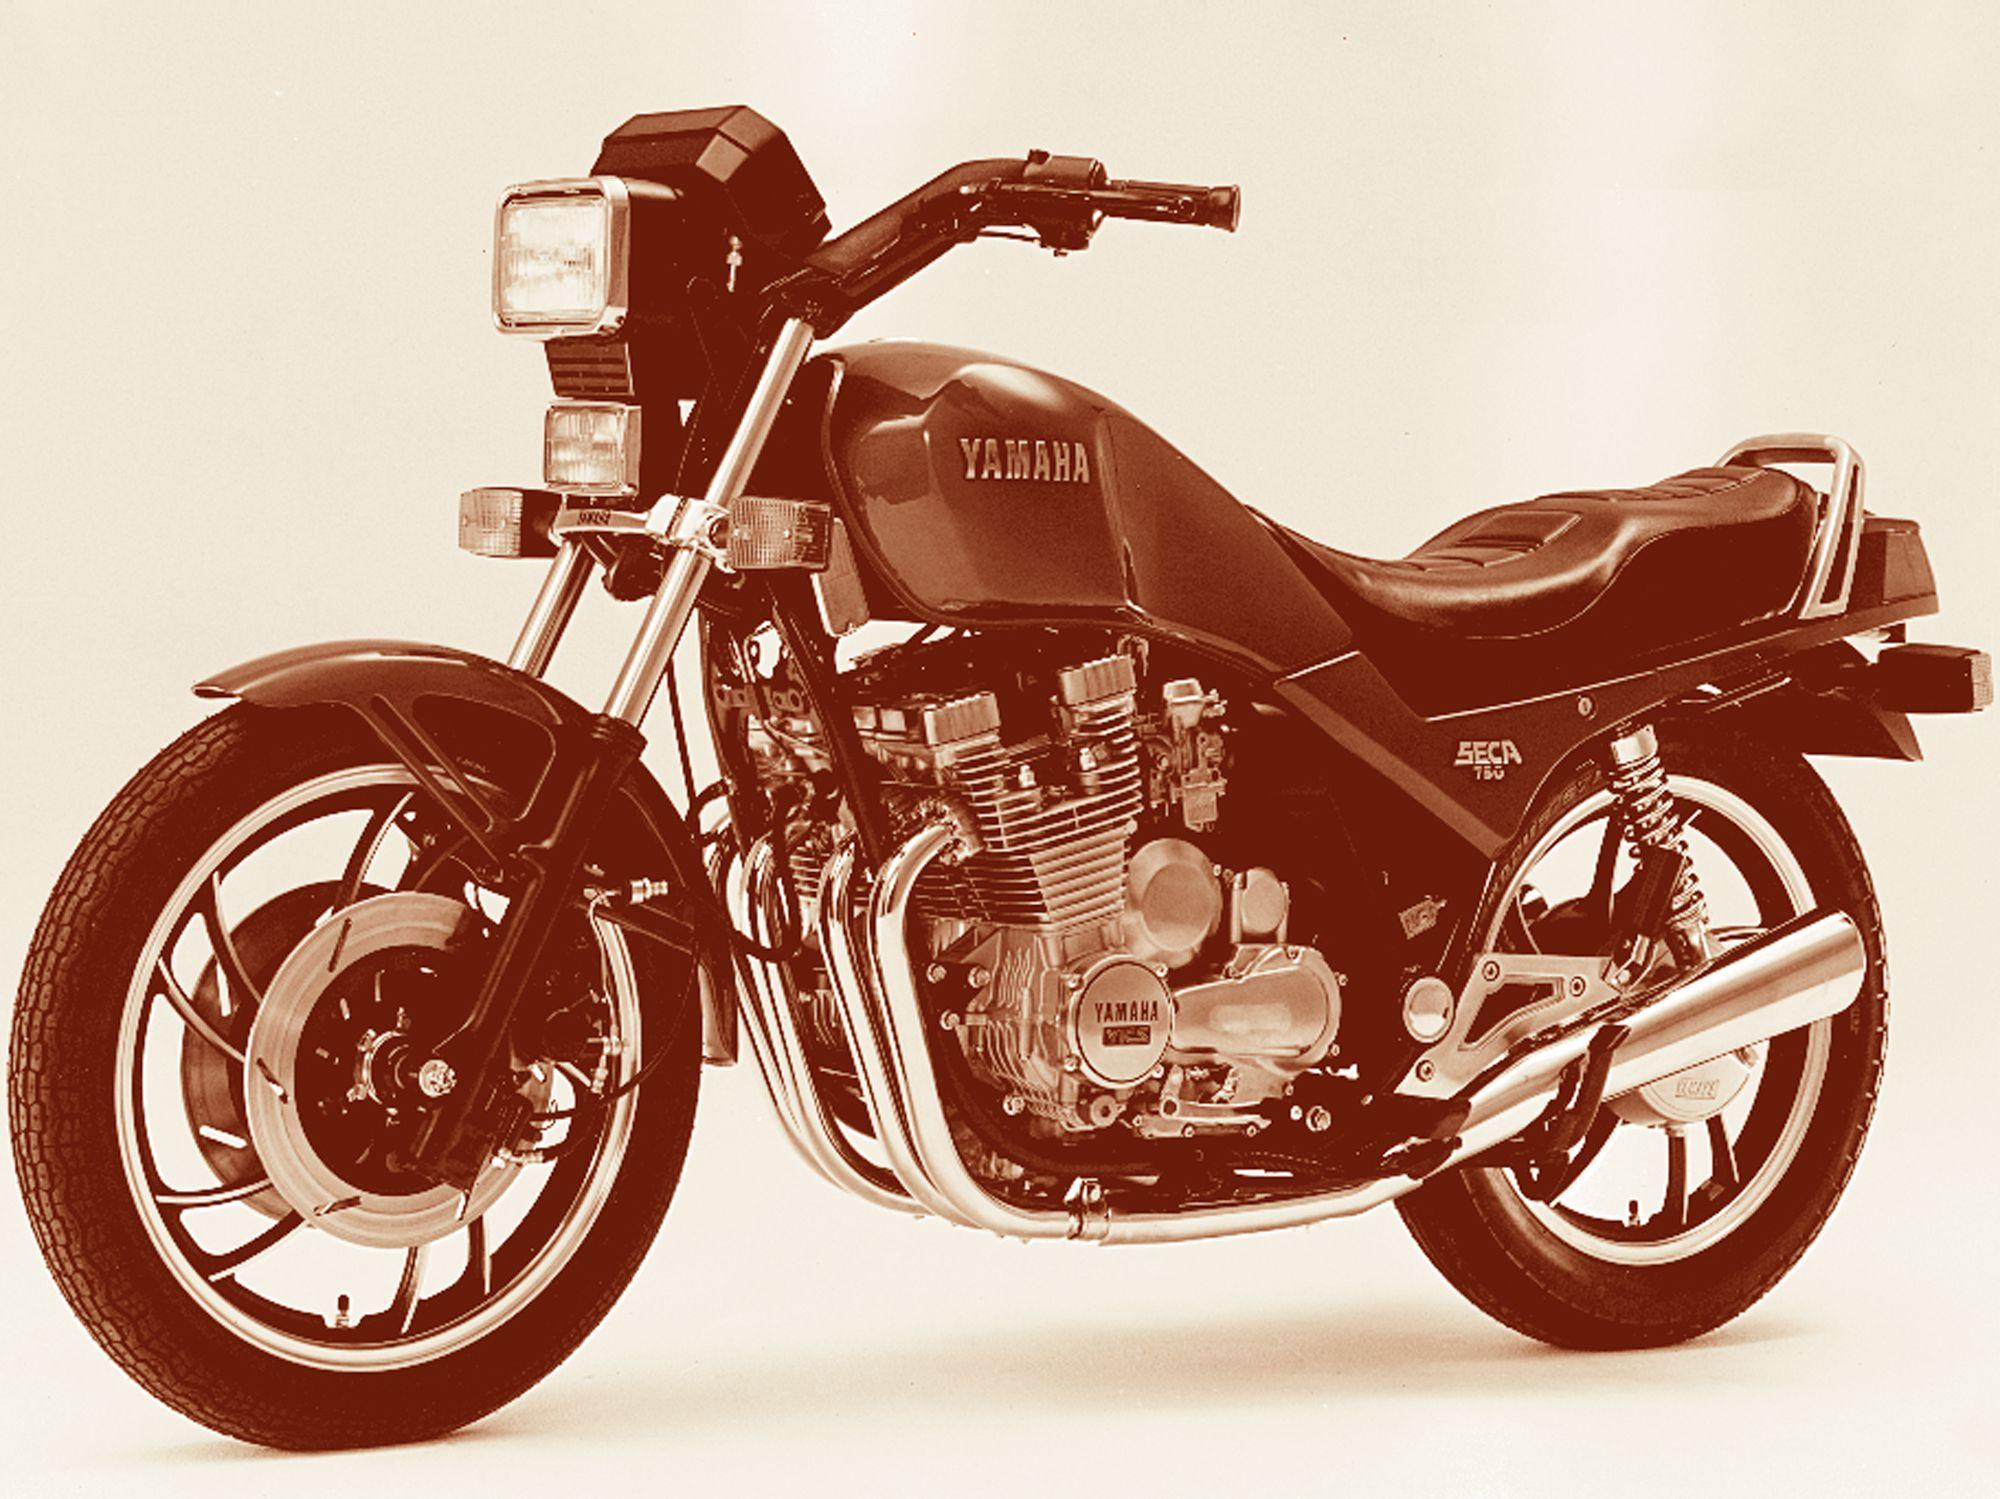 Retrospective: 1981 Yamaha Seca 750 | Cycle World